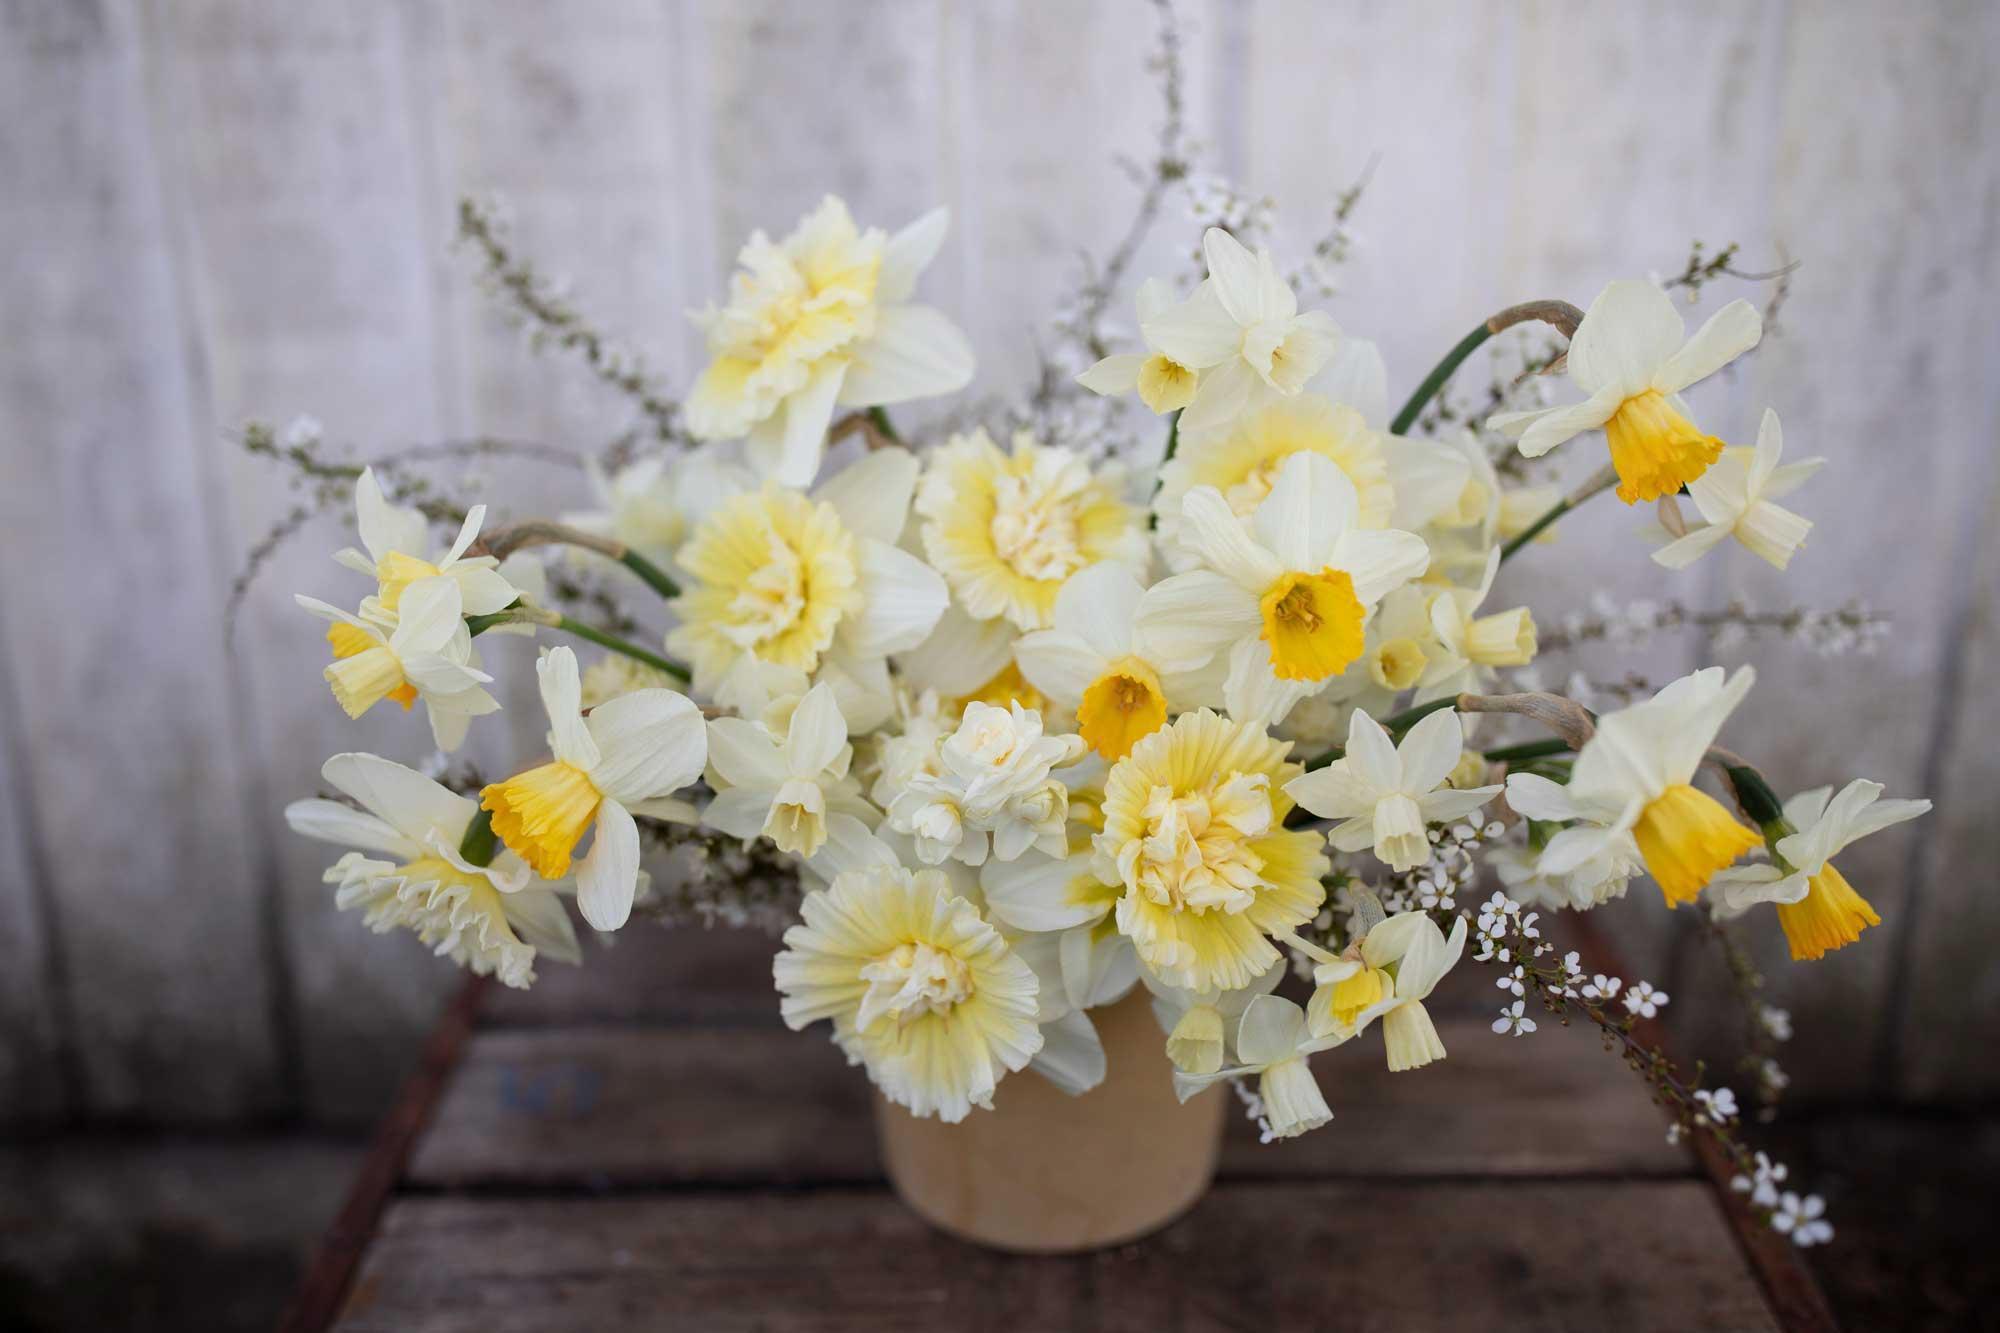 An arrangement of daffodils